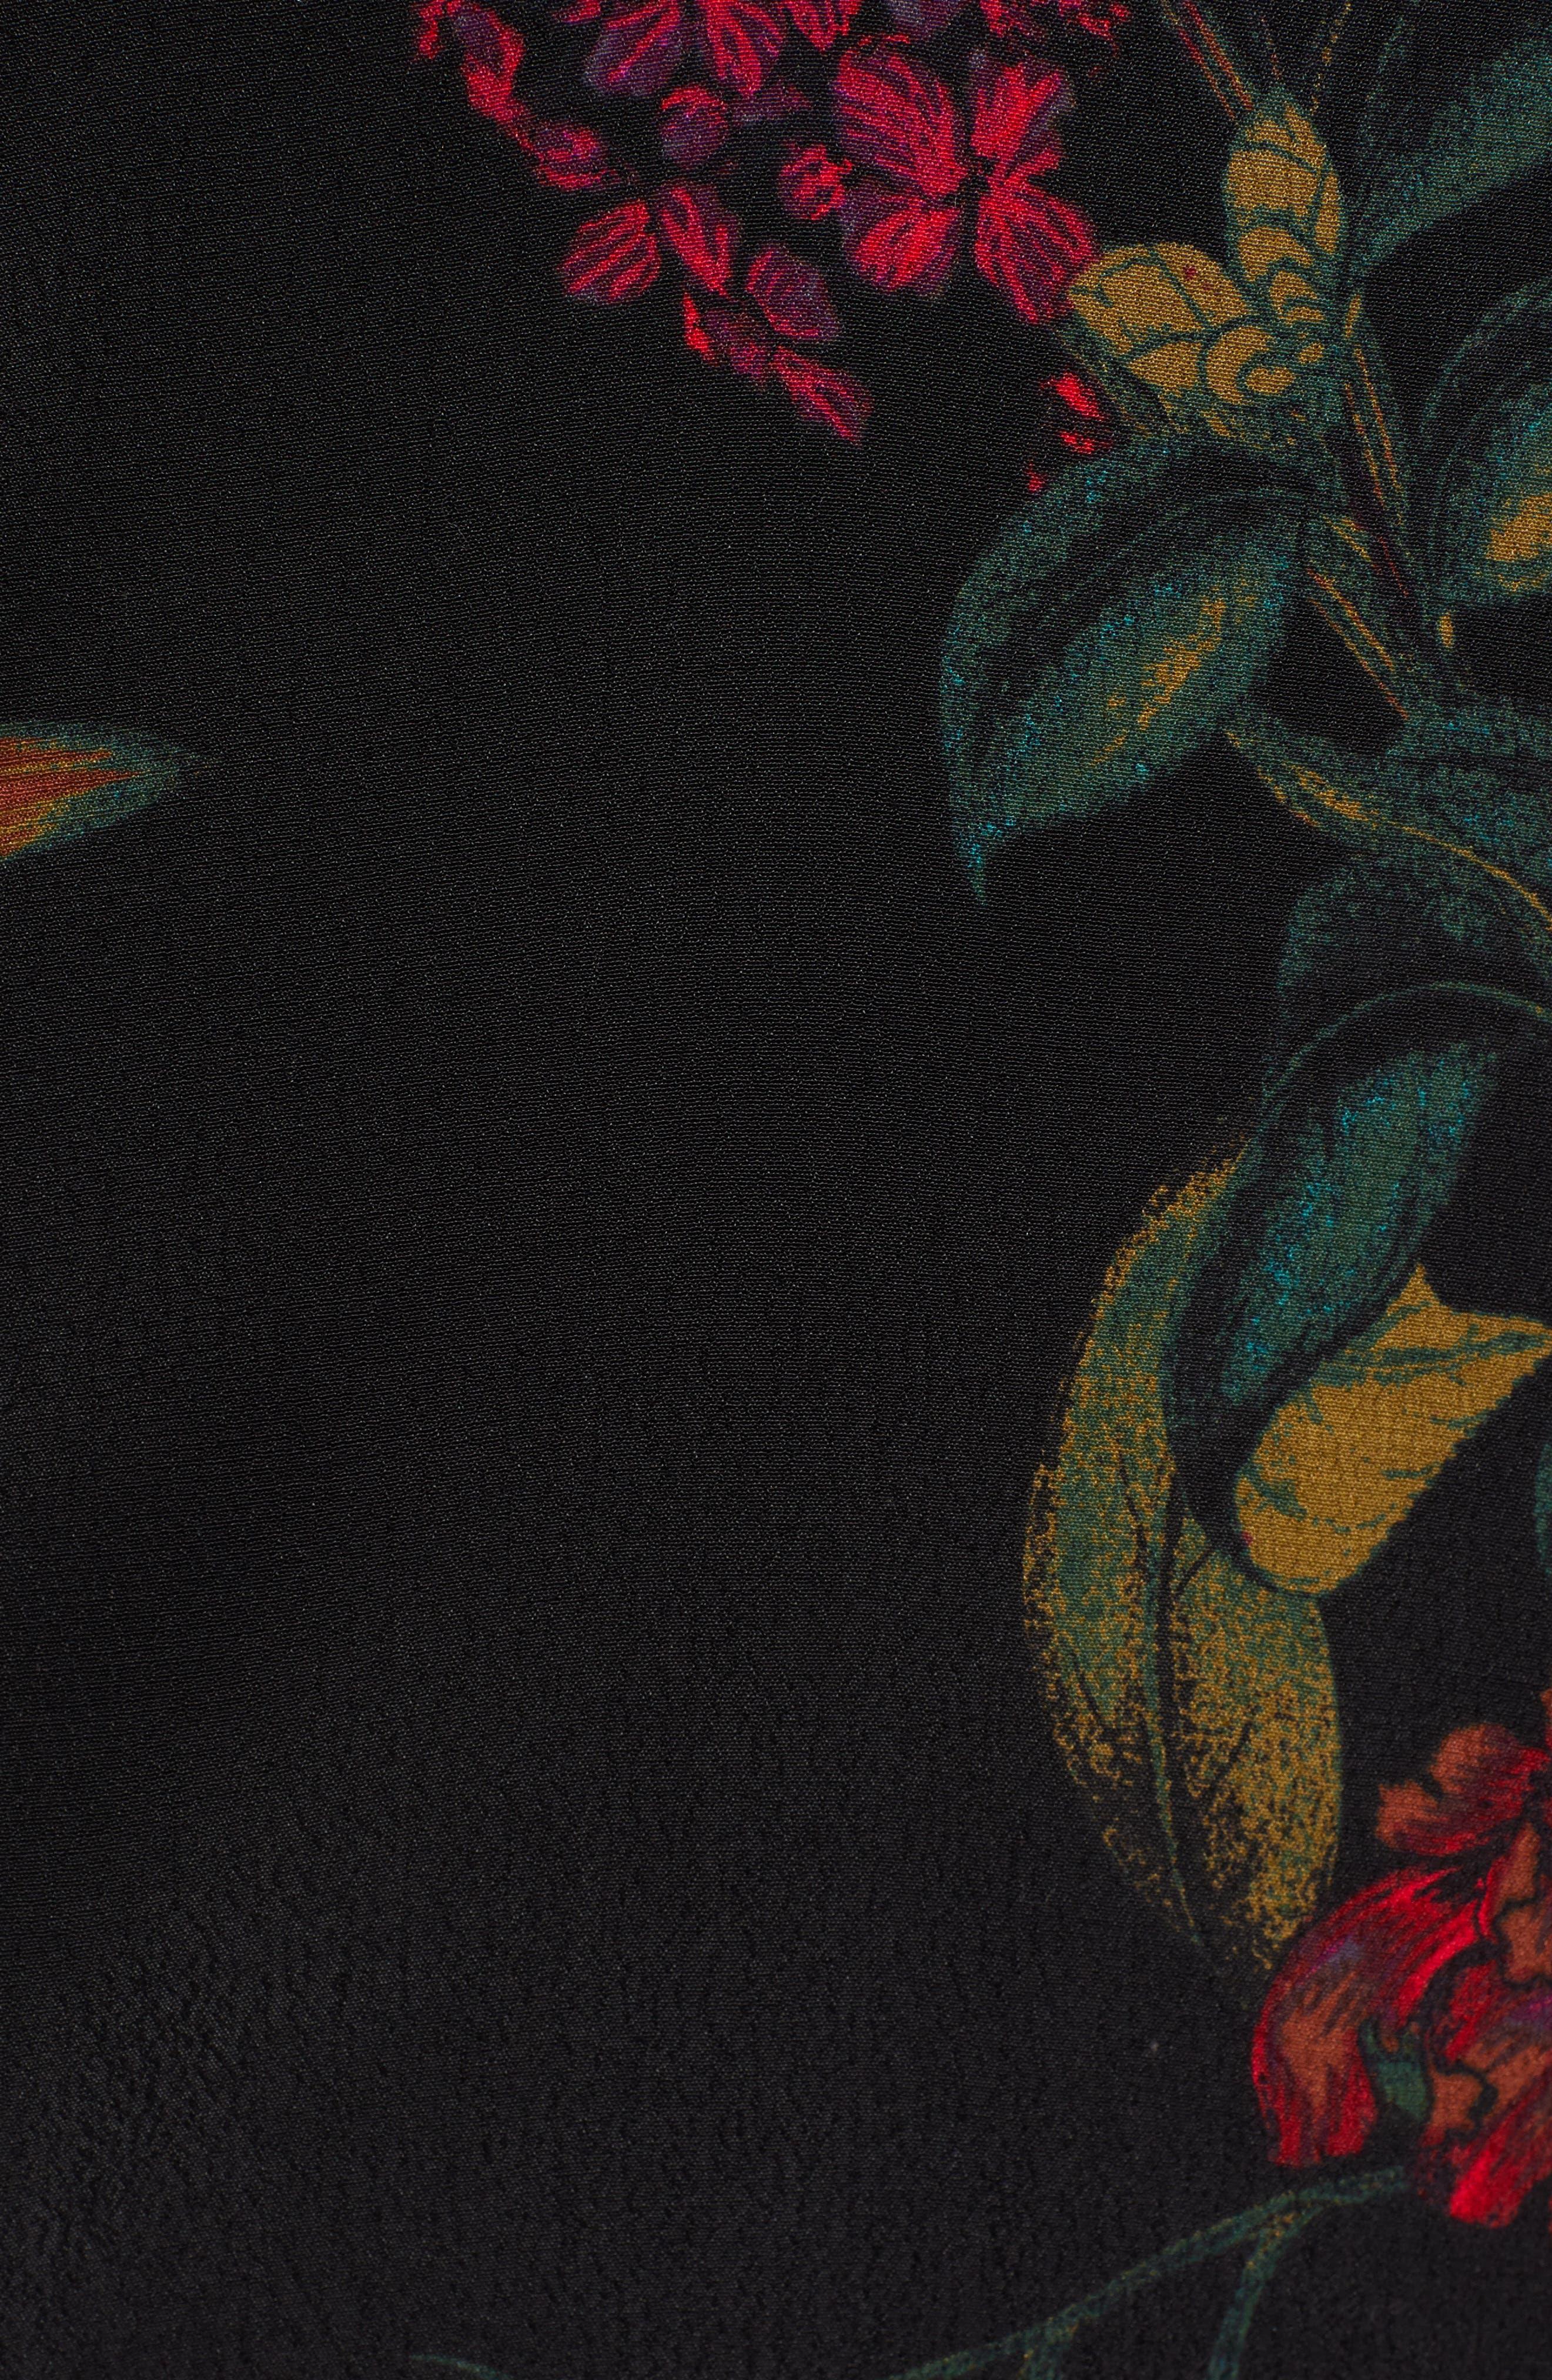 V-Neck Floral Print Minidress,                             Alternate thumbnail 6, color,                             BLACK STATEMENT FLORAL